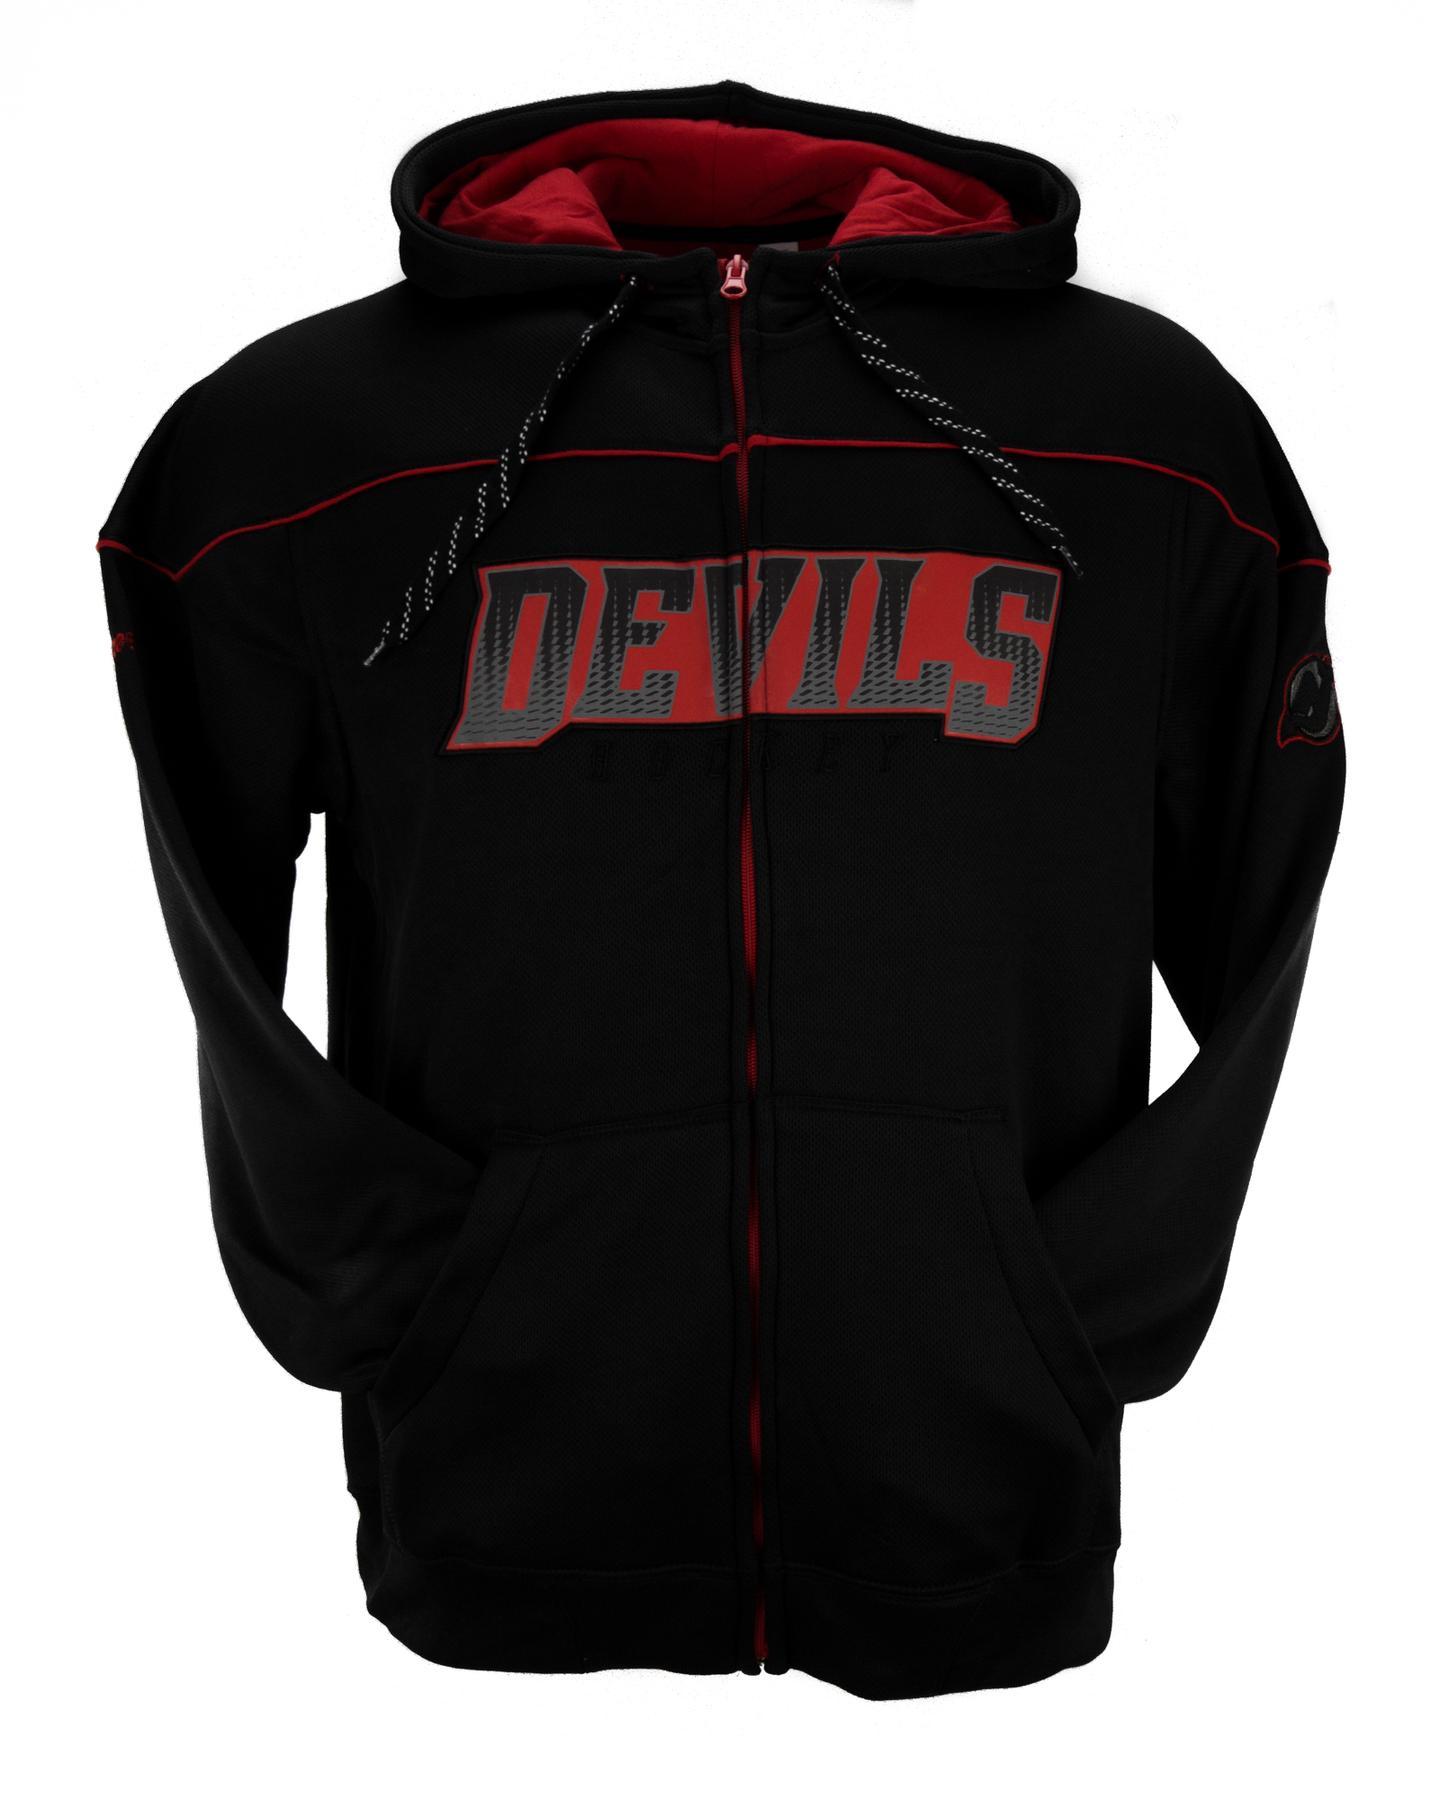 New jersey devils hoodie